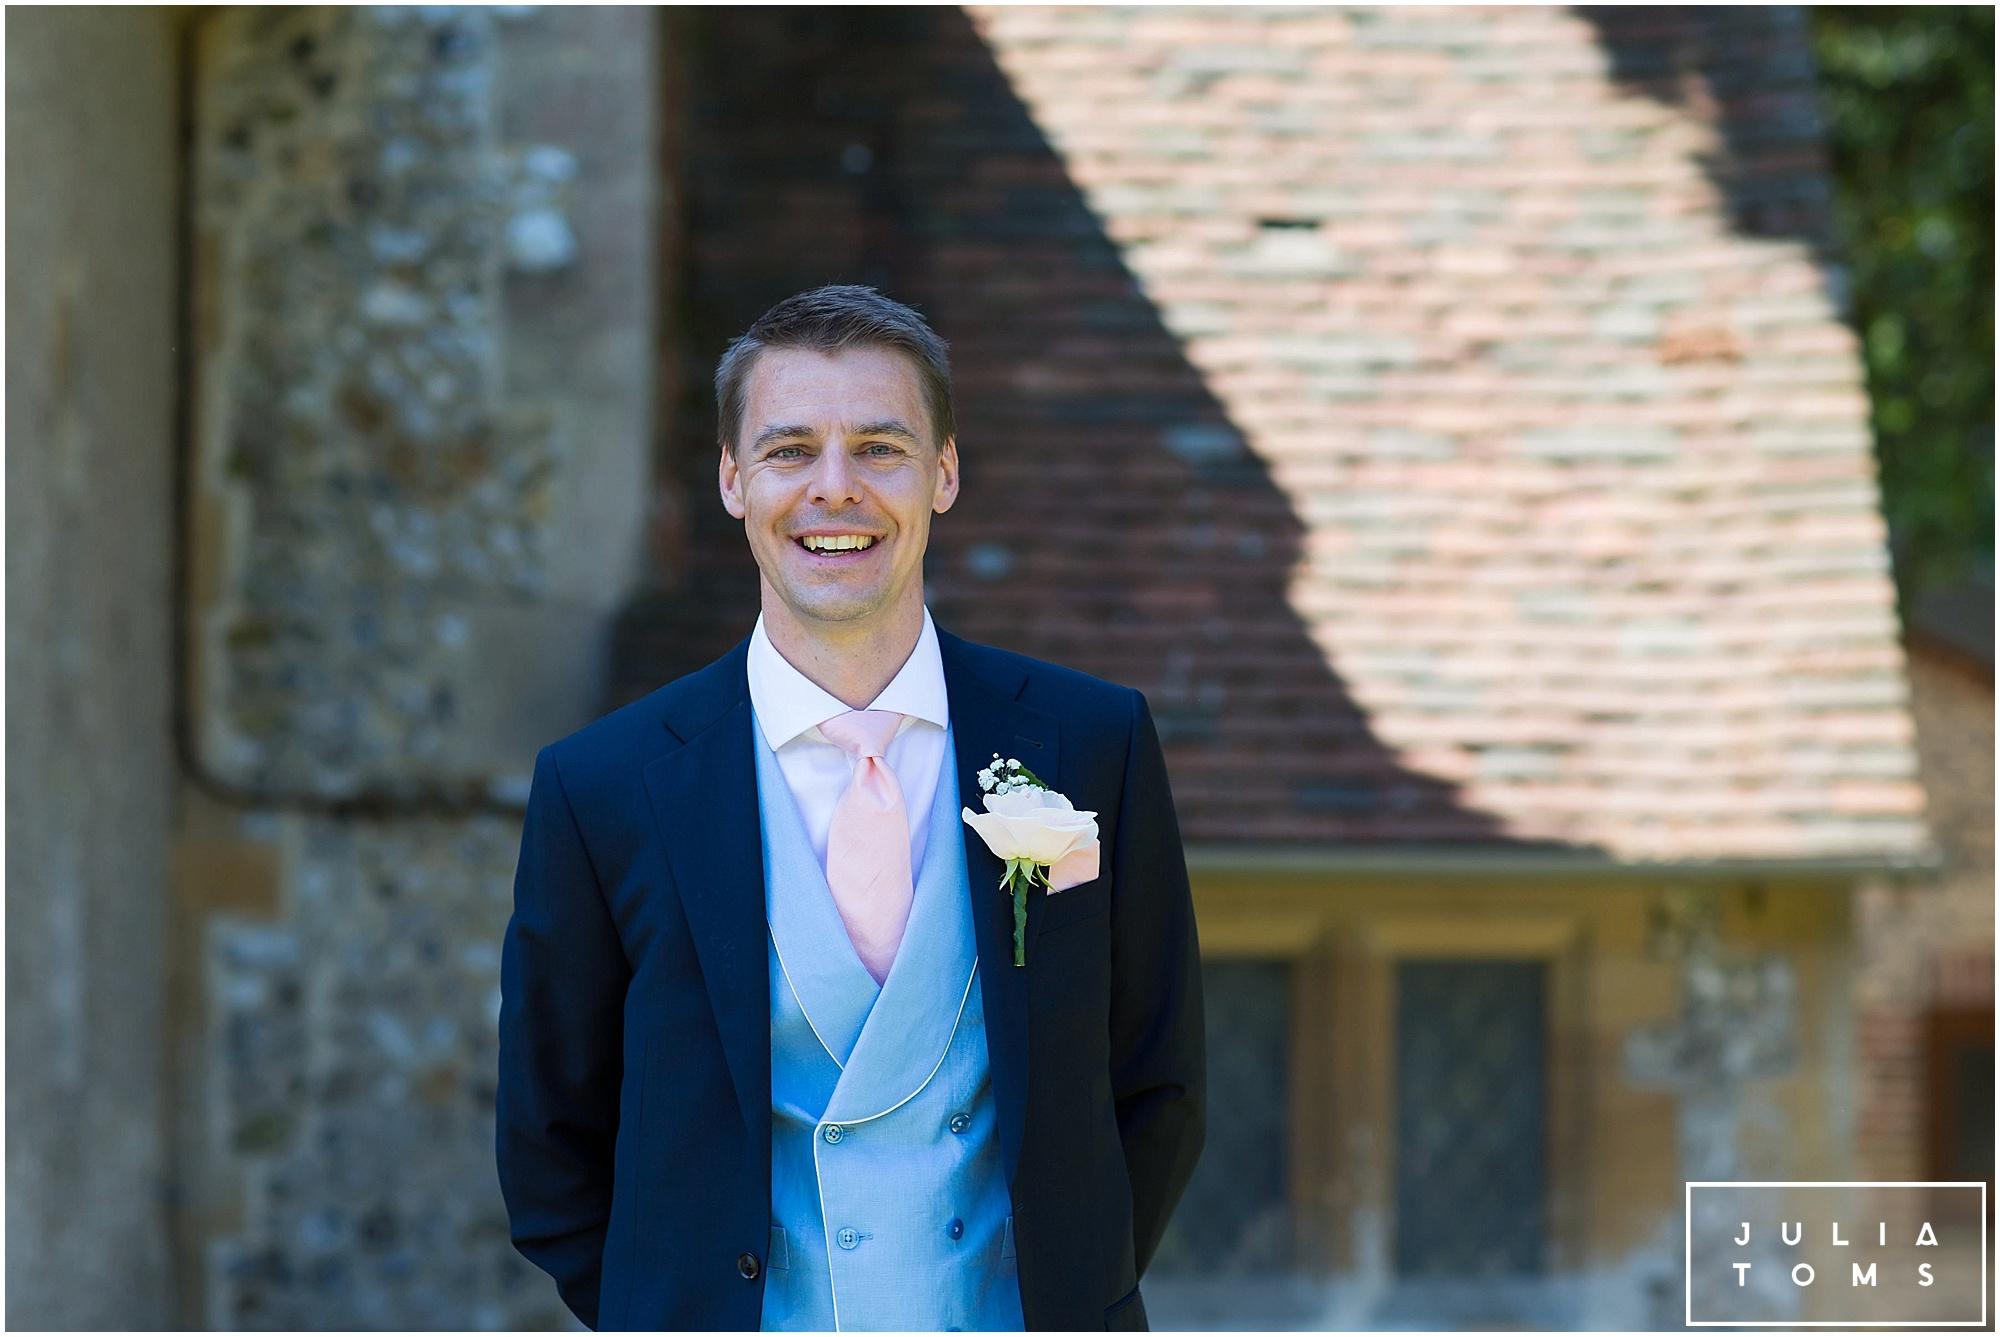 julia_toms_chichester_wedding_photographer_portsmouth_019.jpg